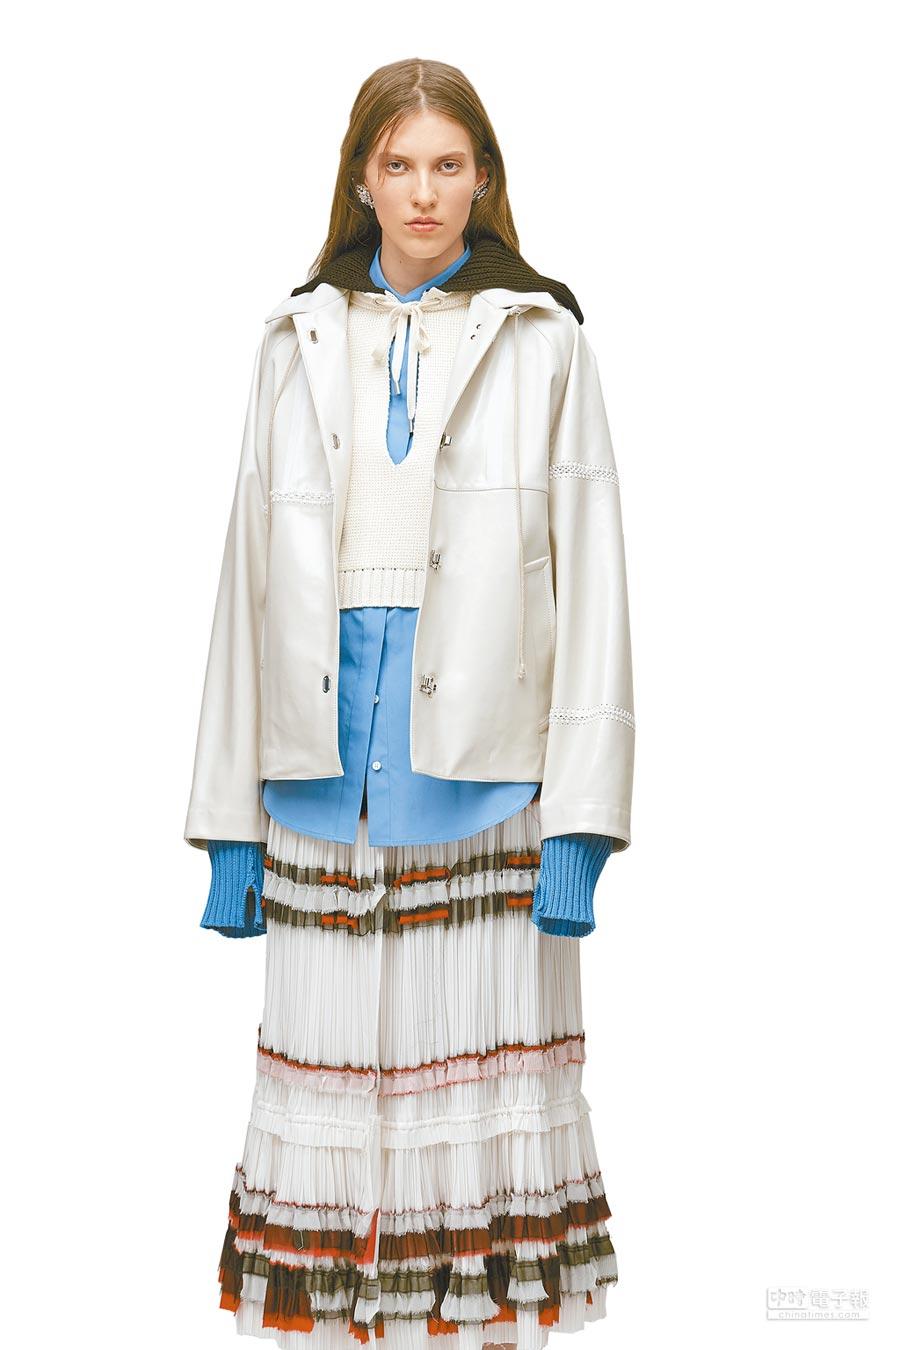 3.1 Phillip Lim 2018早秋系列以航海為主題,充滿針織、抽繩細節的單品中,並以縐褶帶出吉普賽般的浪漫情調,模特穿水手領針織衫2萬3500元、白色縐褶長裙3萬4000元。(3.1 Phillip Lim提供)